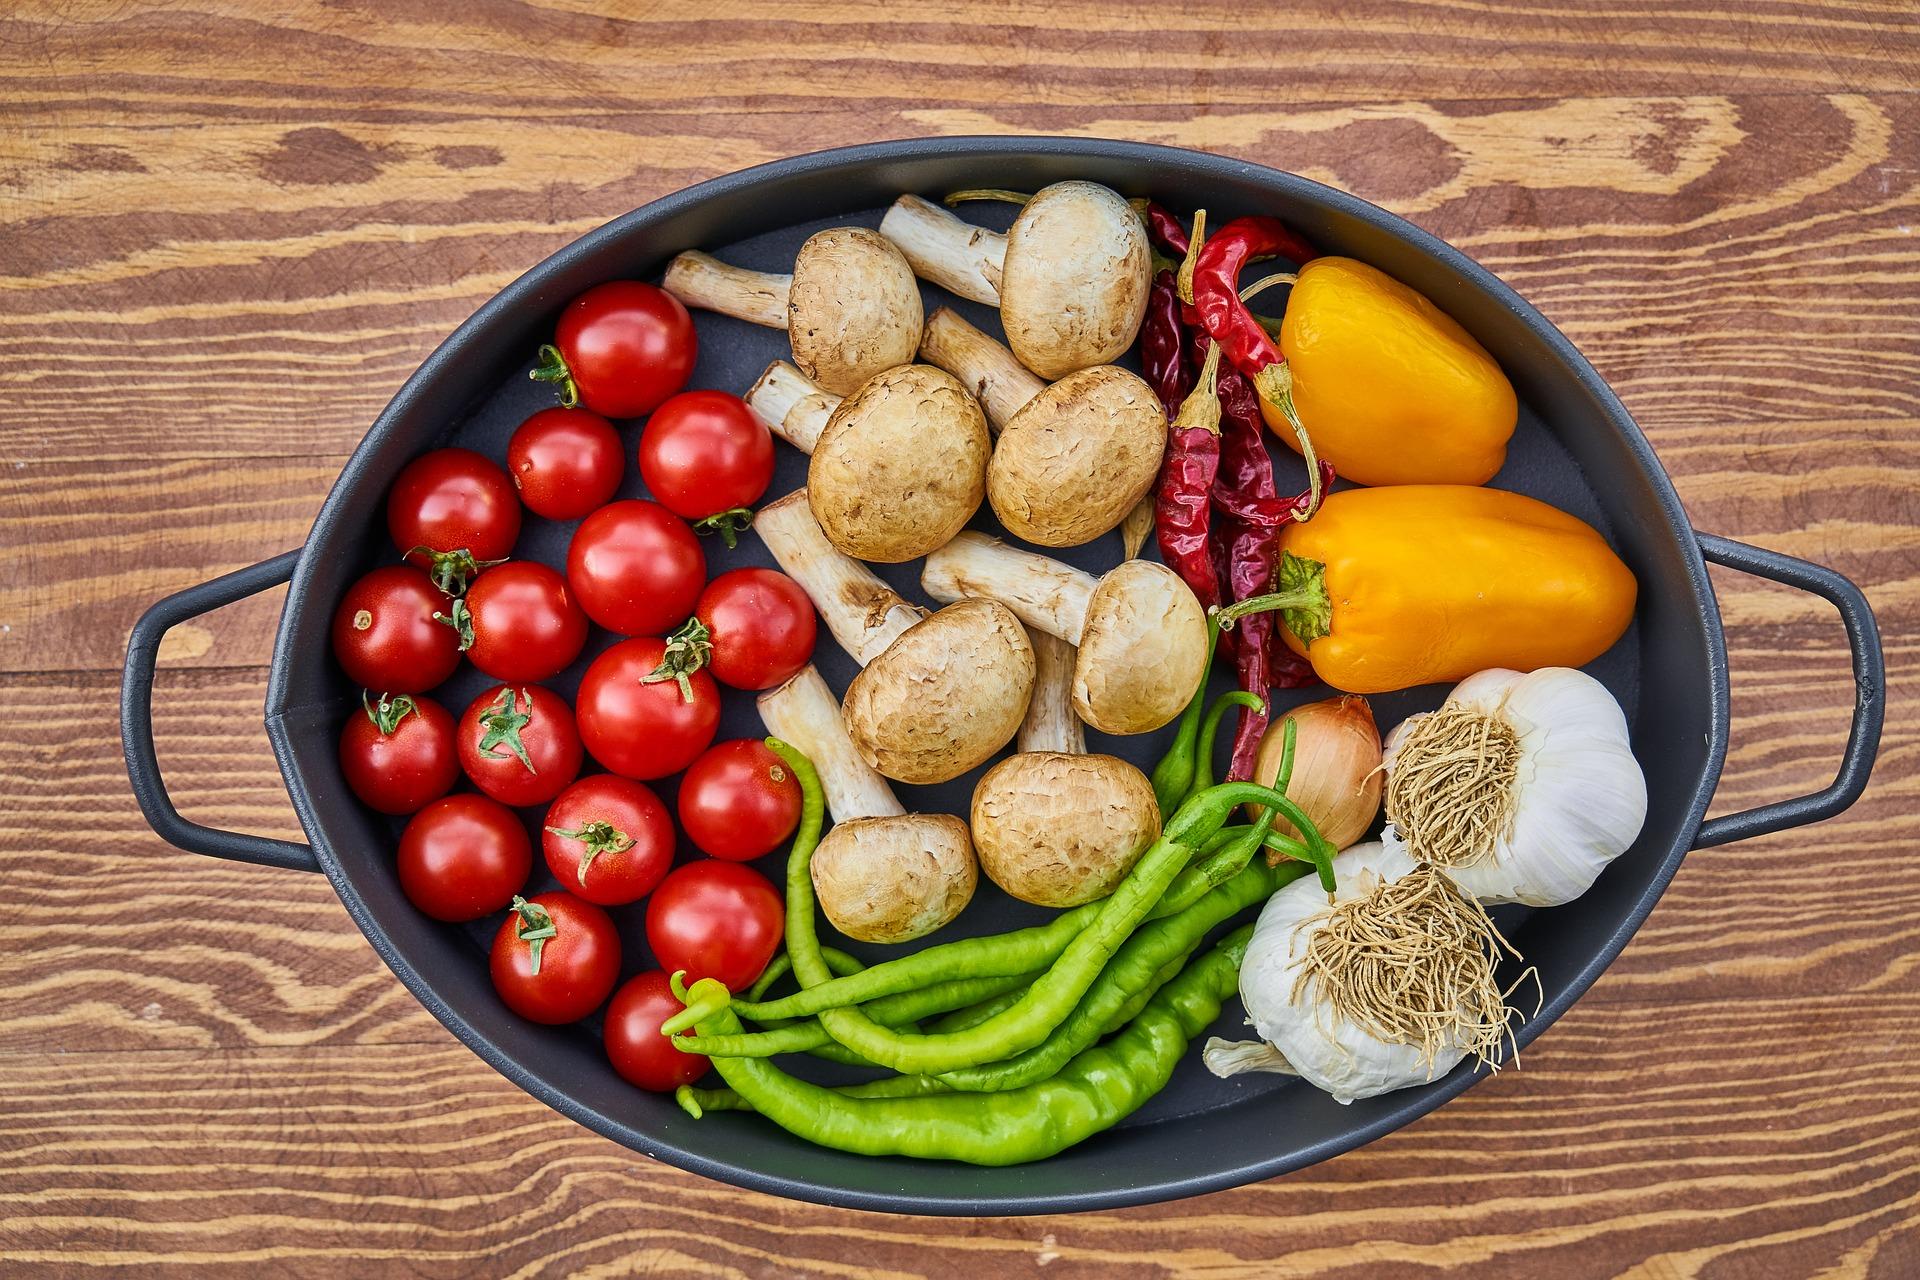 cazuela, tomates, hongos, chilles